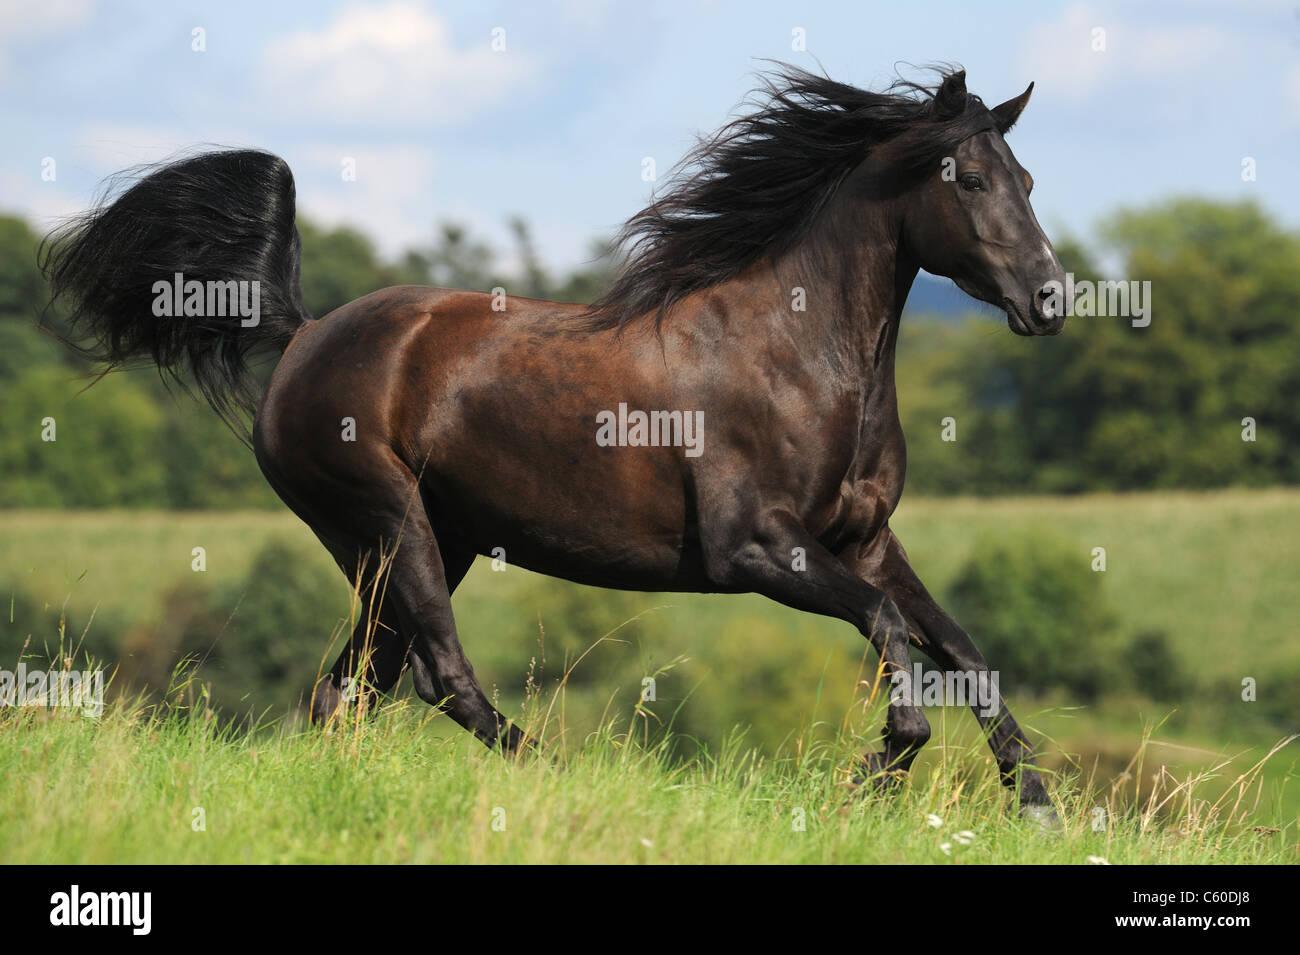 Morgan Horse (Equus ferus caballus). Black mare in a gallop on a meadow. - Stock Image